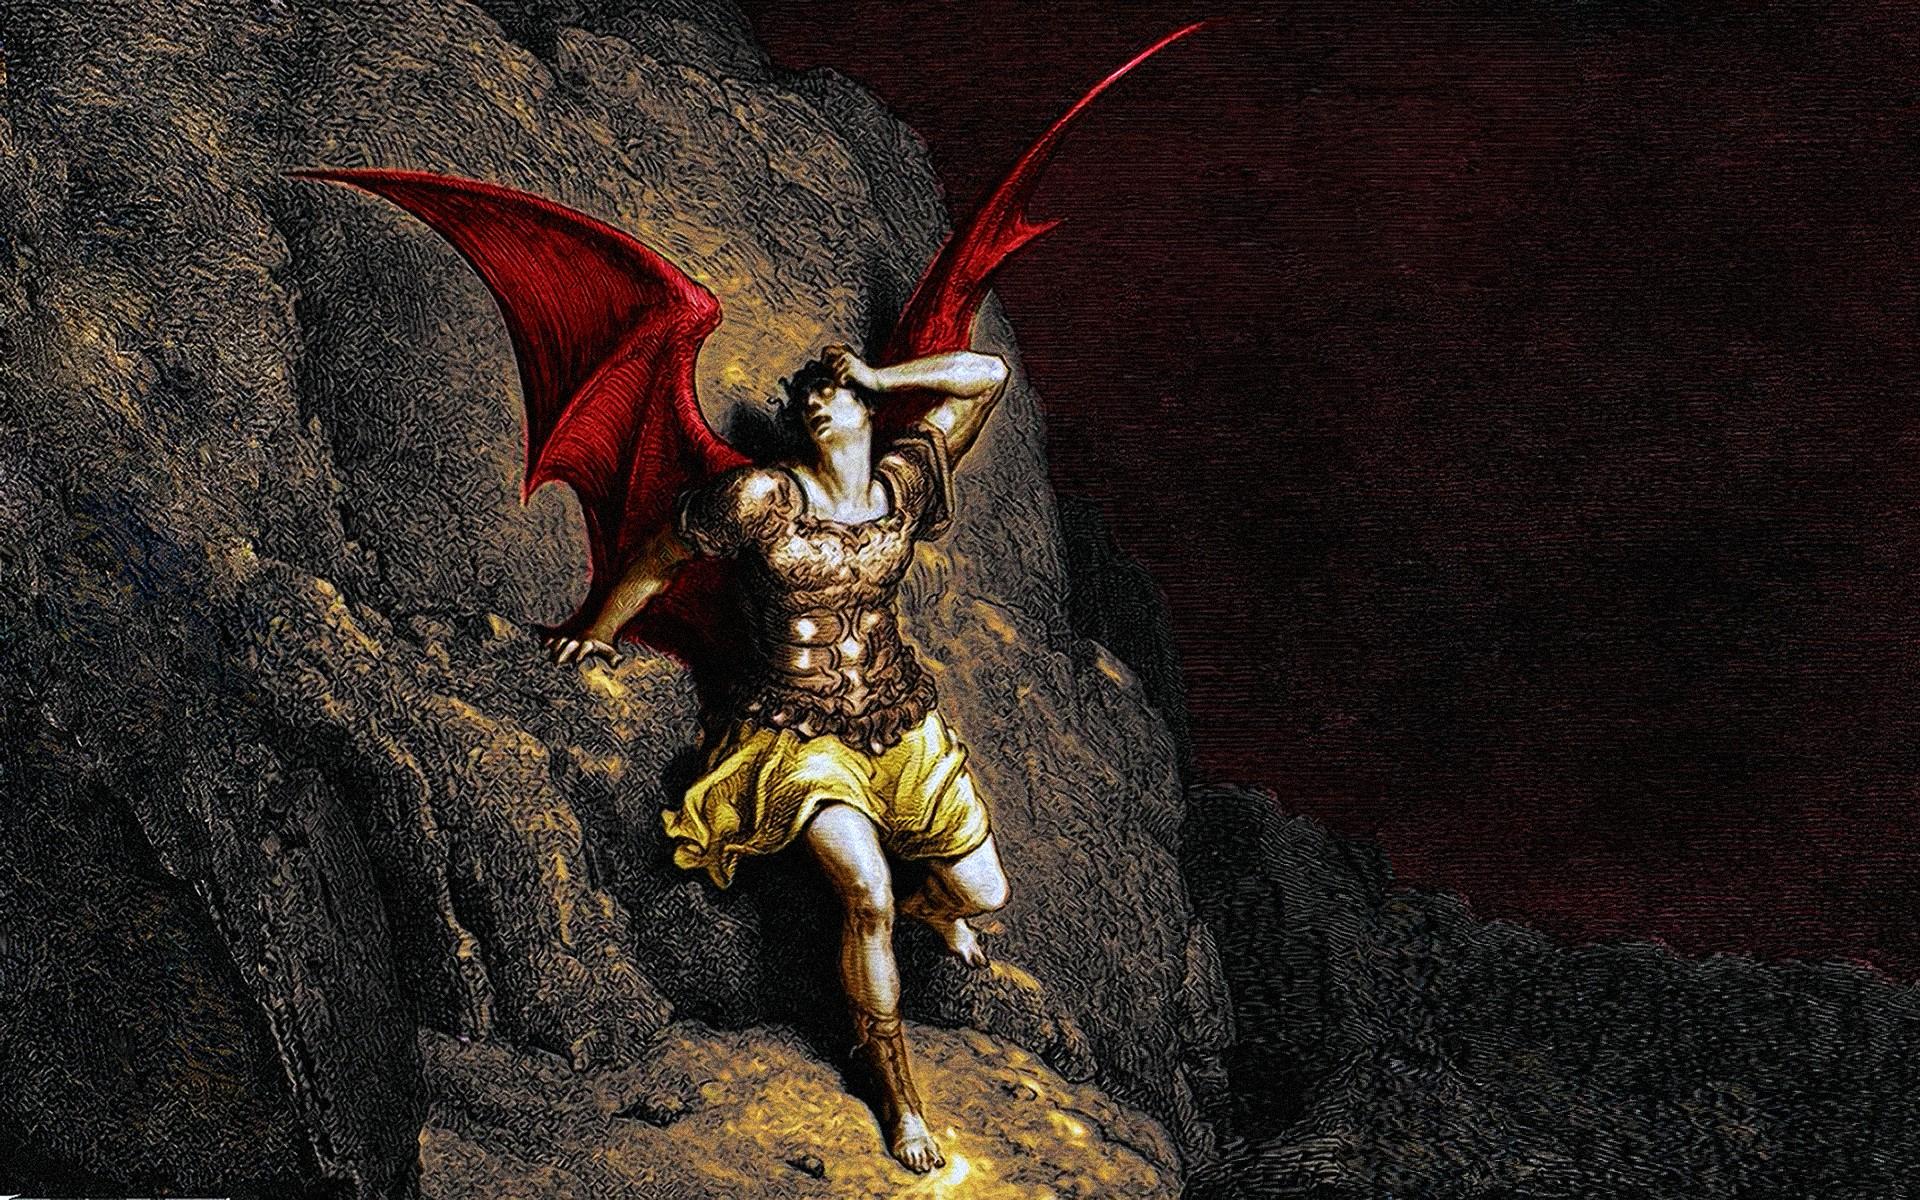 hell heaven satan demonic lucifer satanic demon wallpaper background 1920x1200